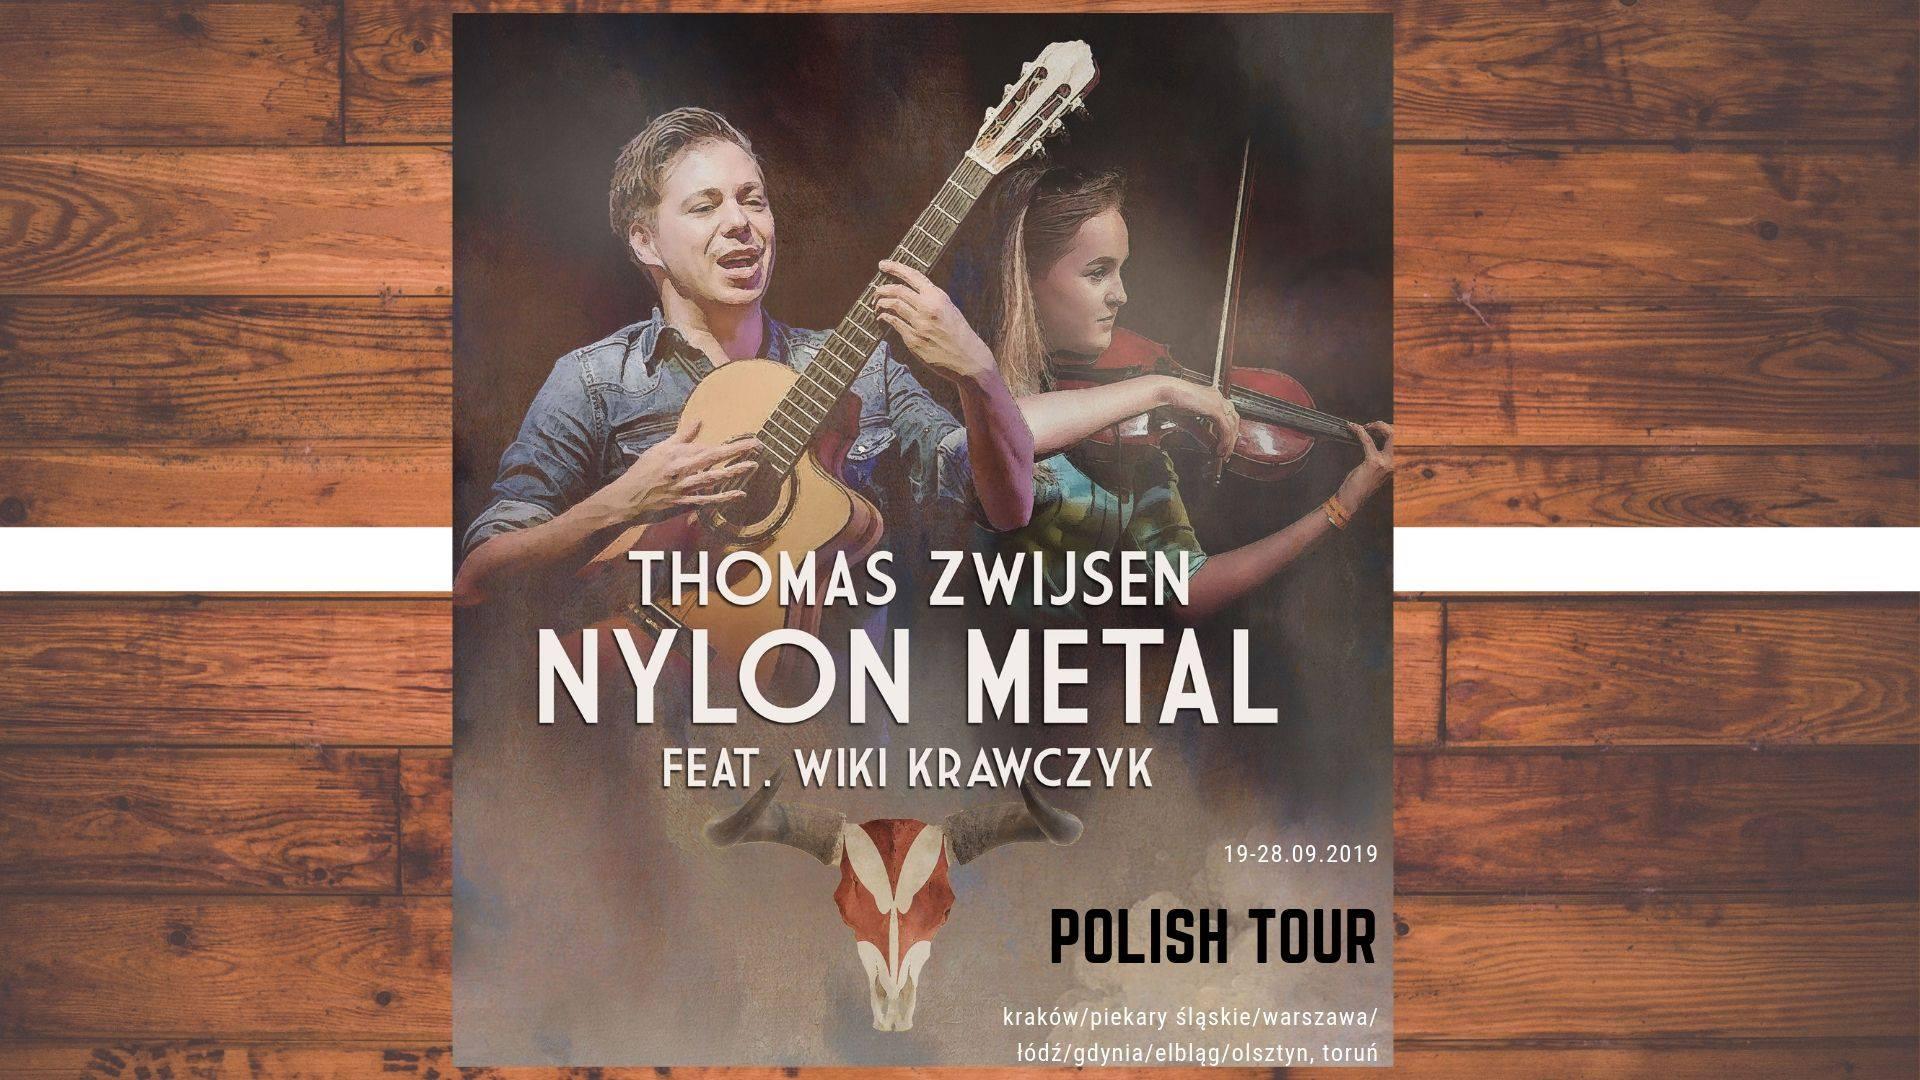 Nylon Metal (Thomas Zwijsen, Wiki Krawczyk) + Scream Maker